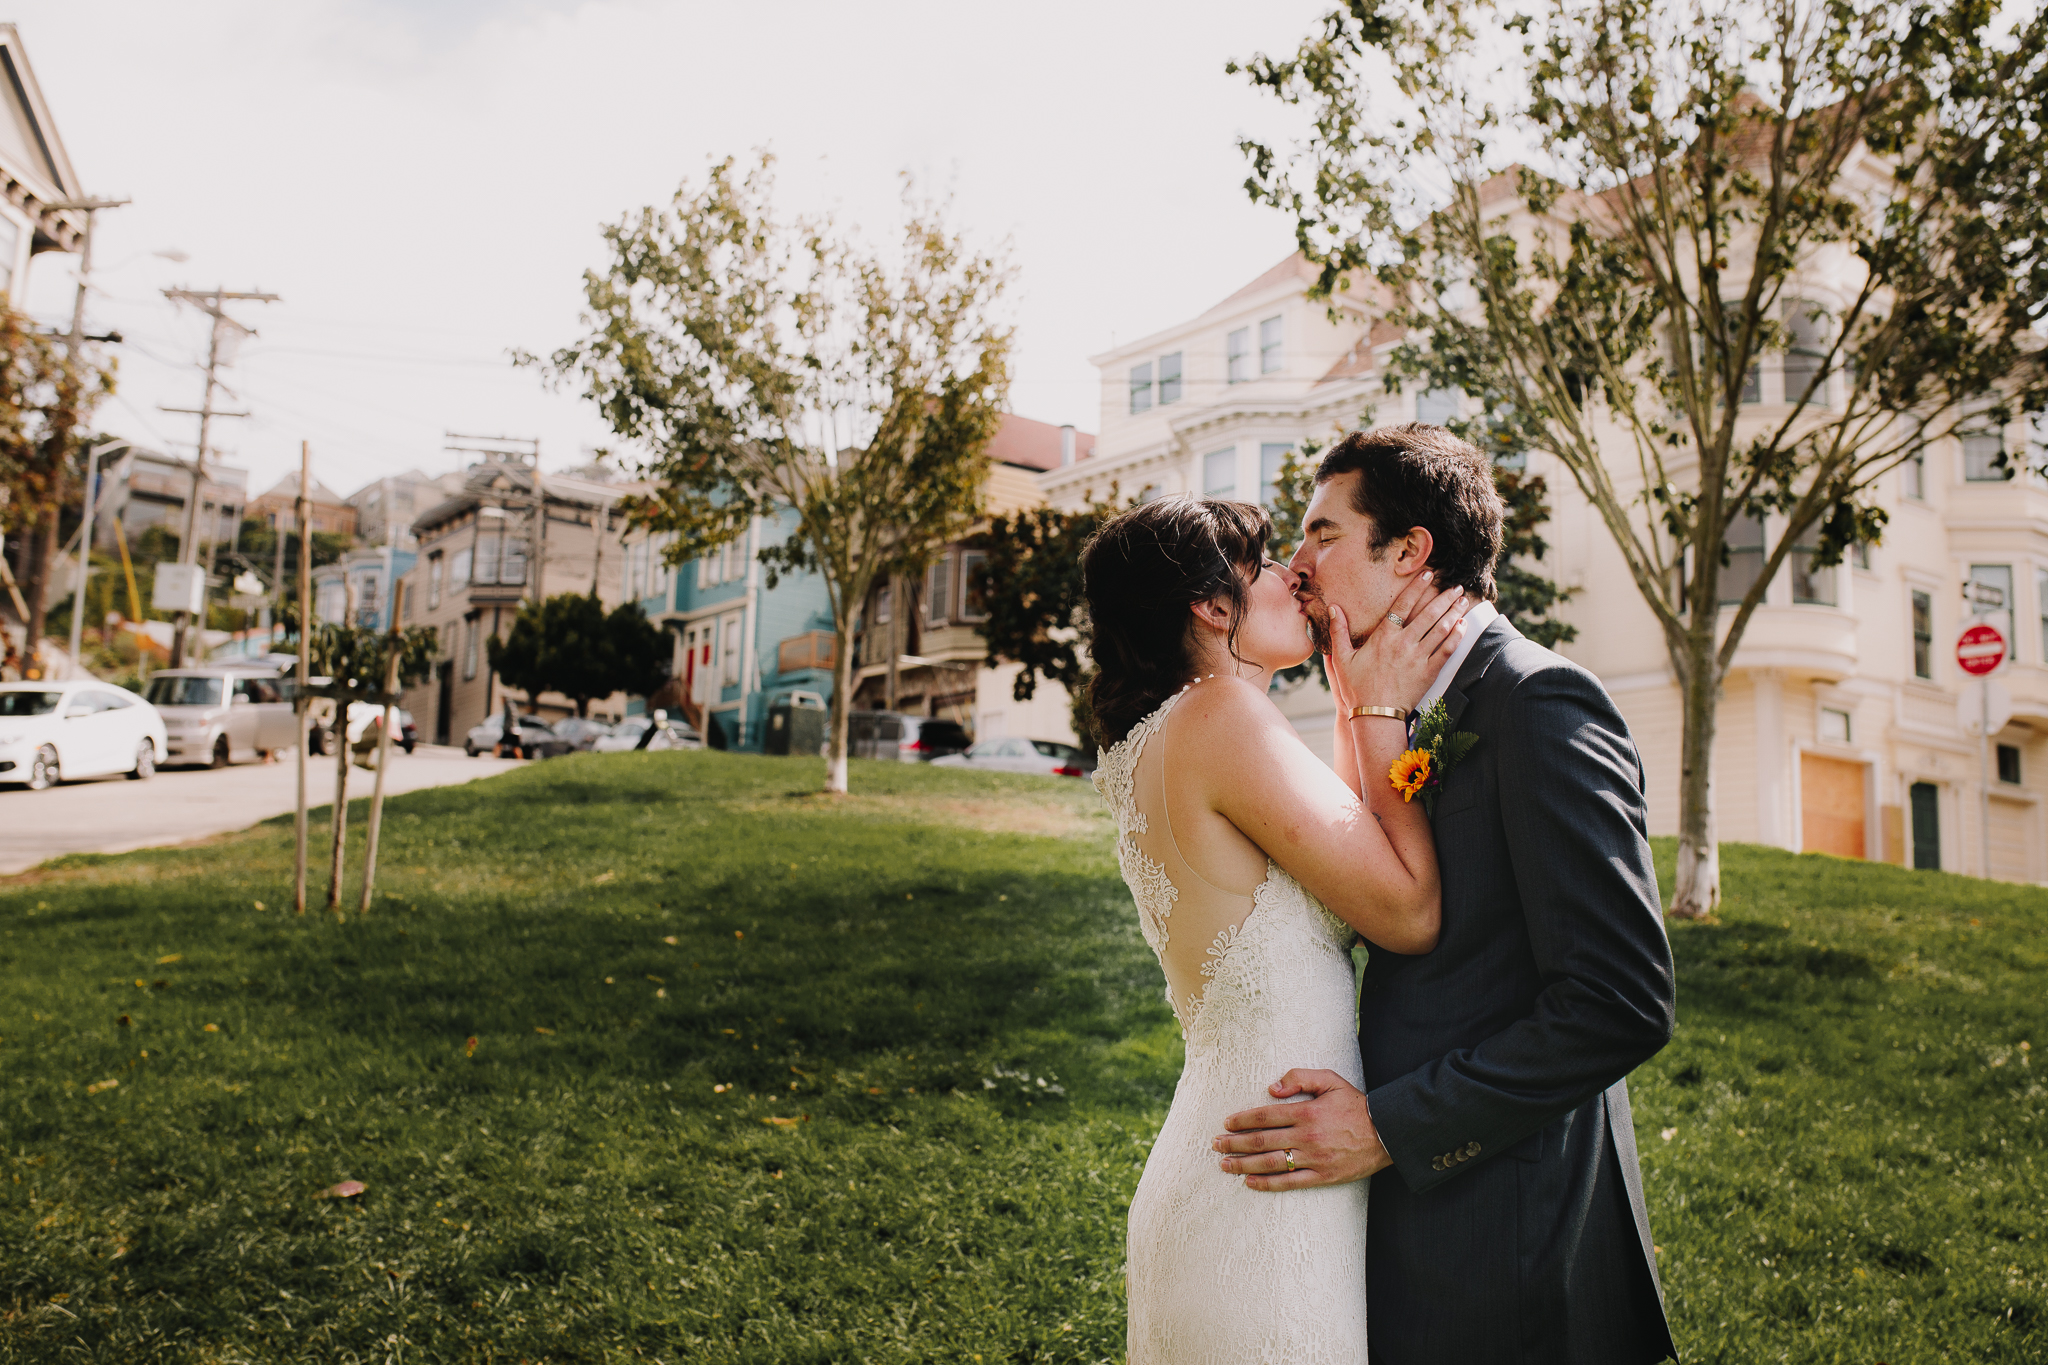 Archer Inspired Photography San Francisco Bay Area Wedding Lifestyle Documentary City Bar Photographer-9.jpg